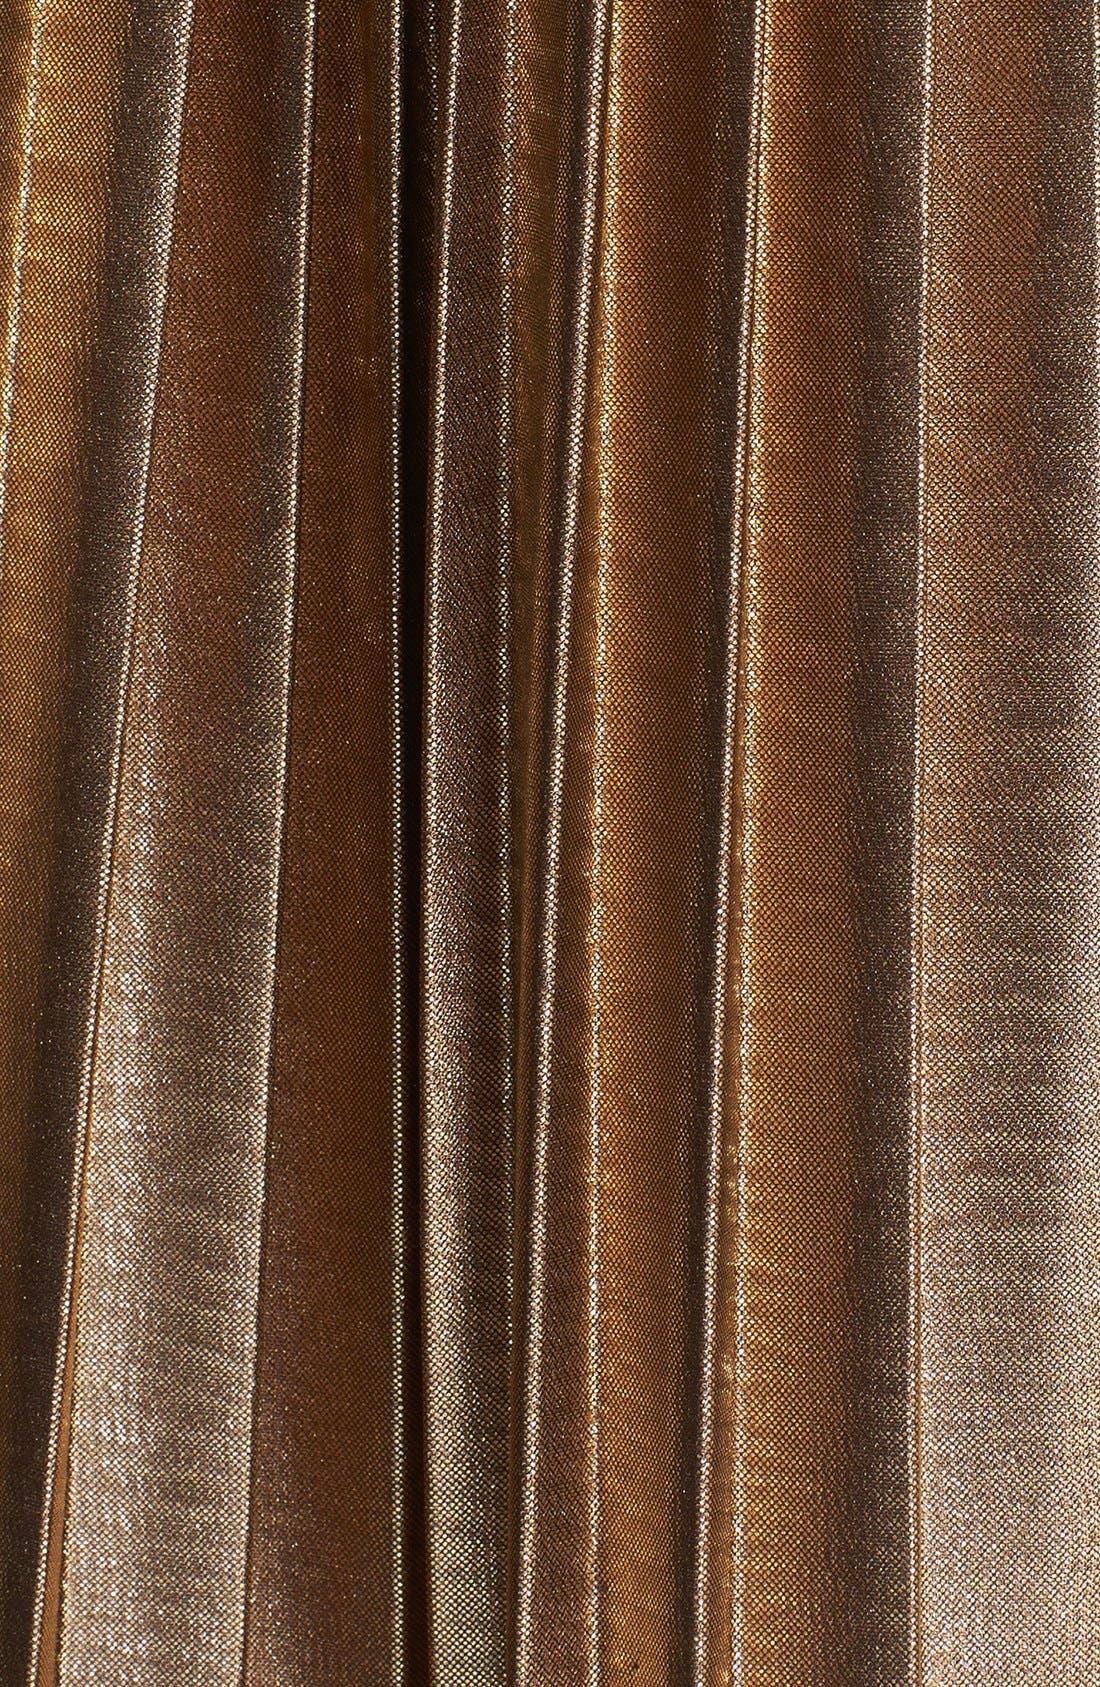 Alternate Image 3  - Rules of Etiquette Metallic Pleat Skirt